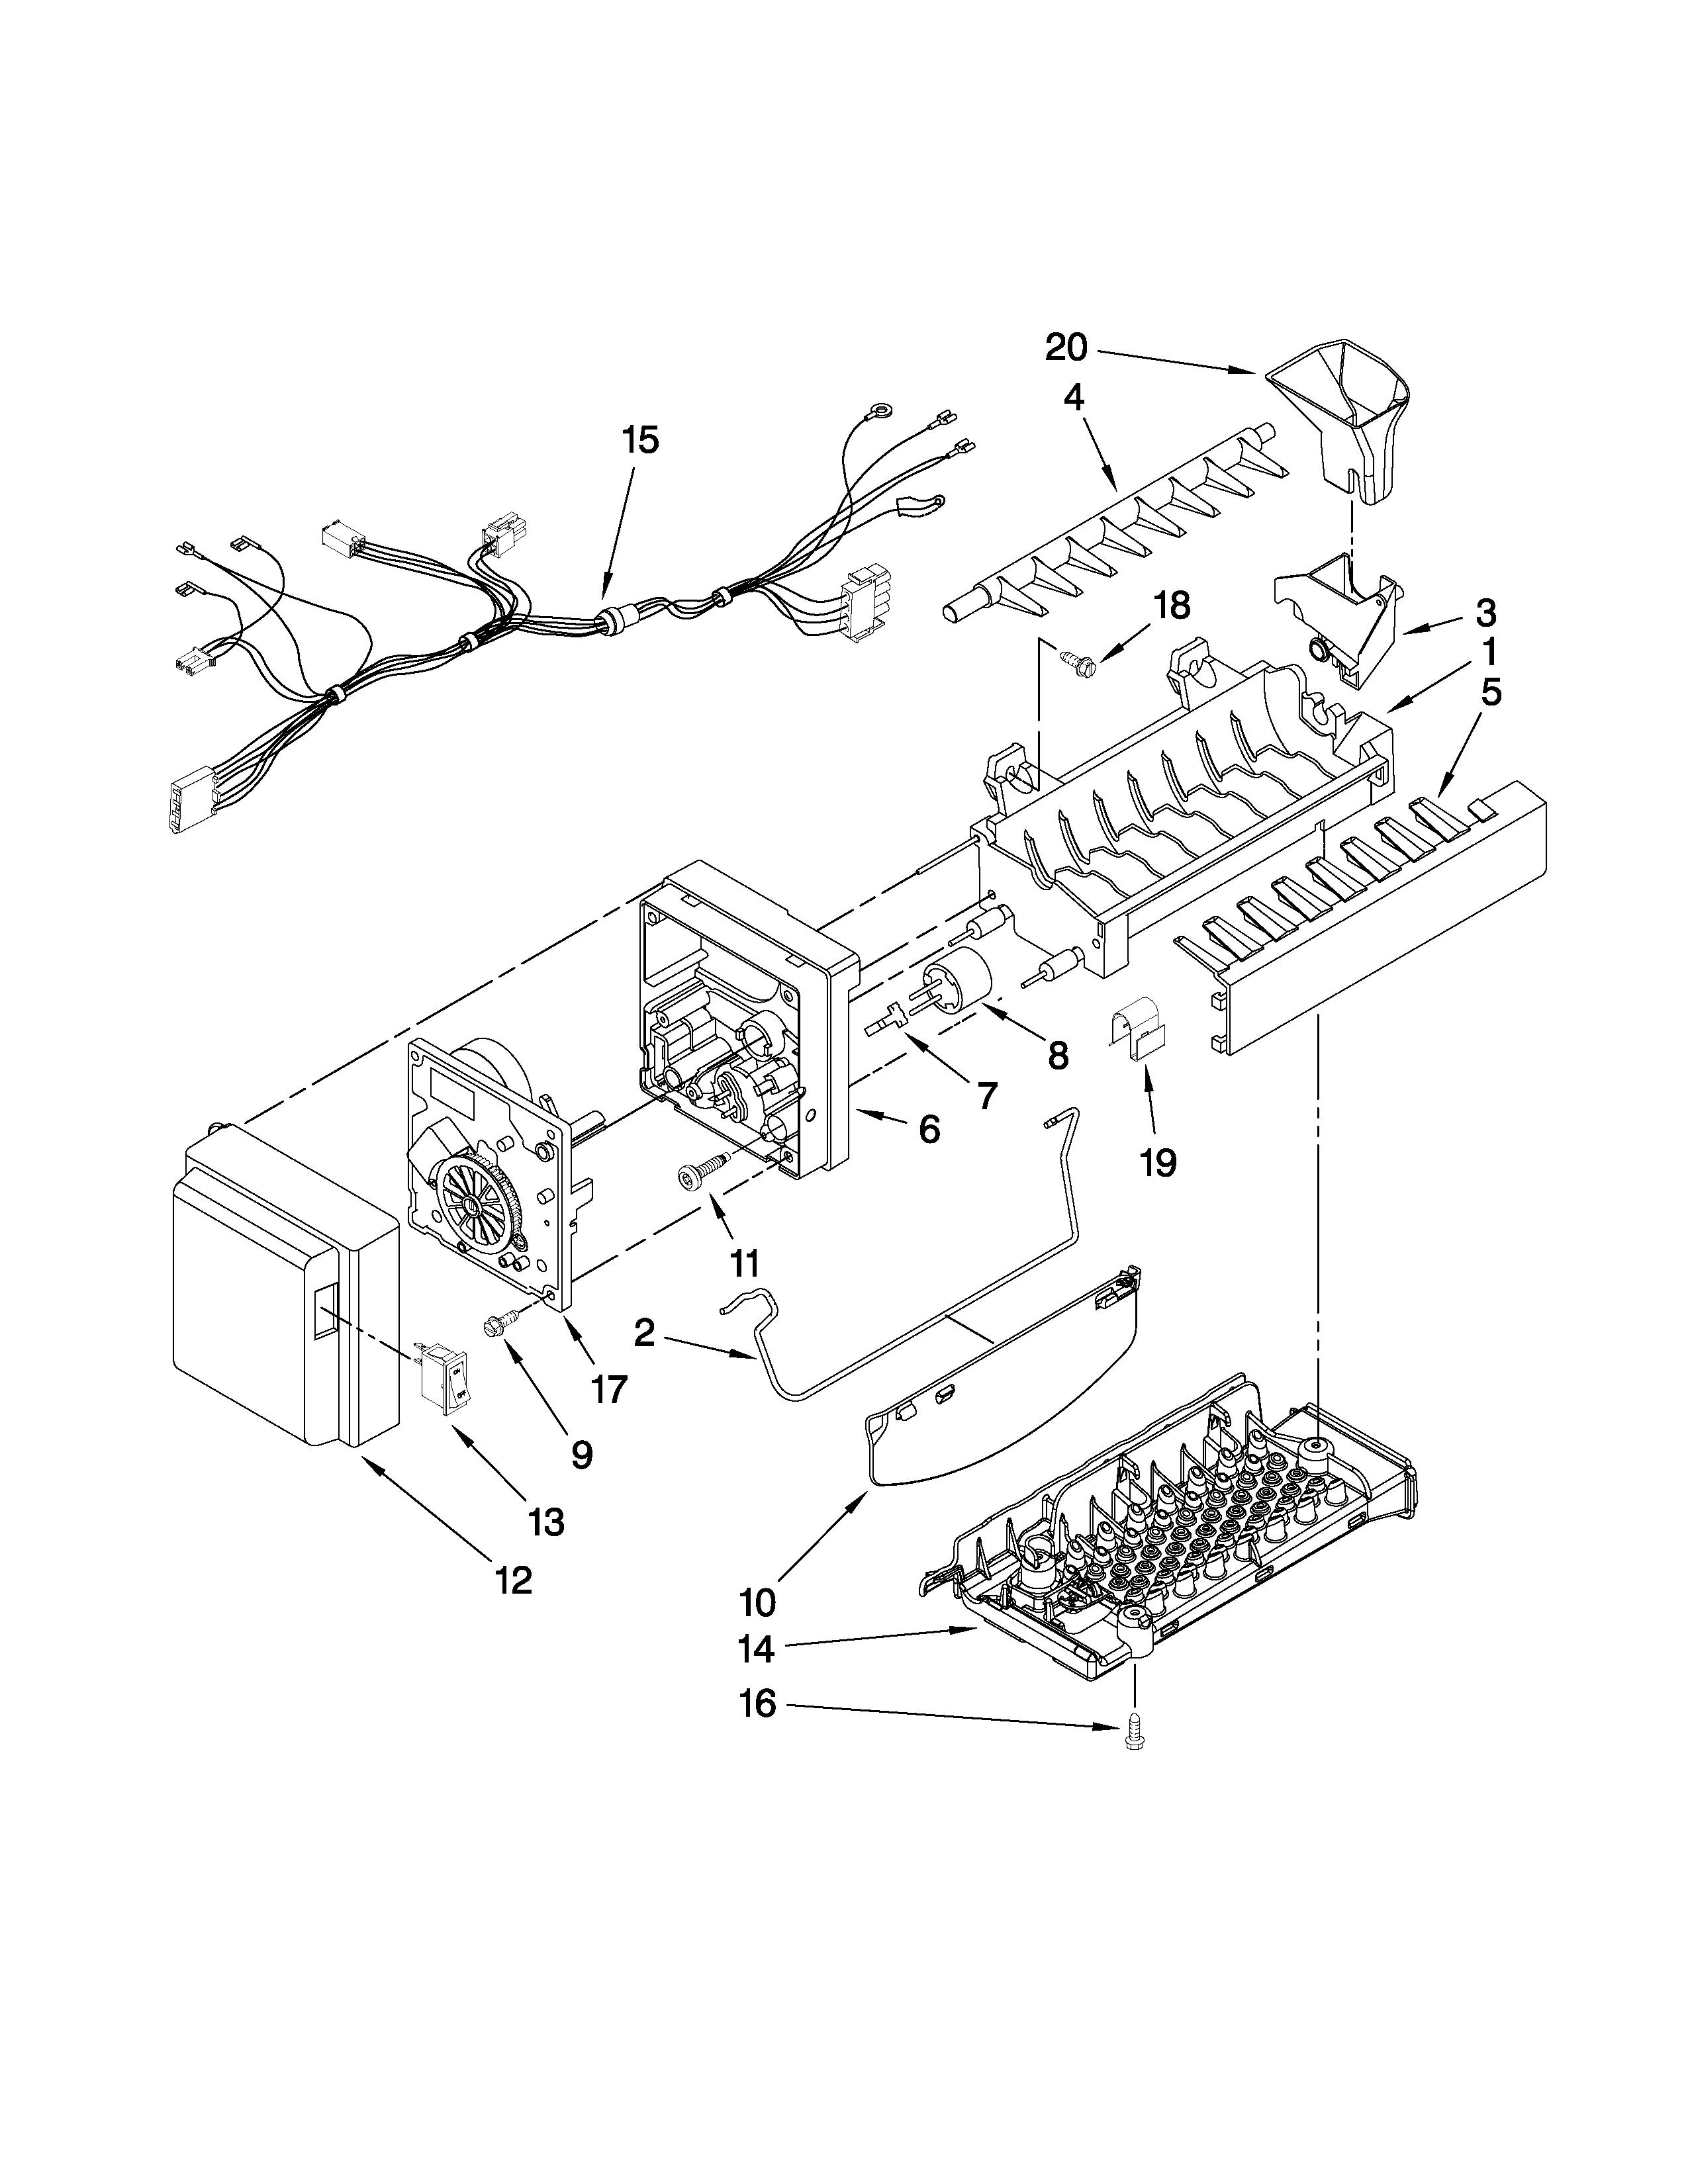 whirlpool refrigerator parts list manual